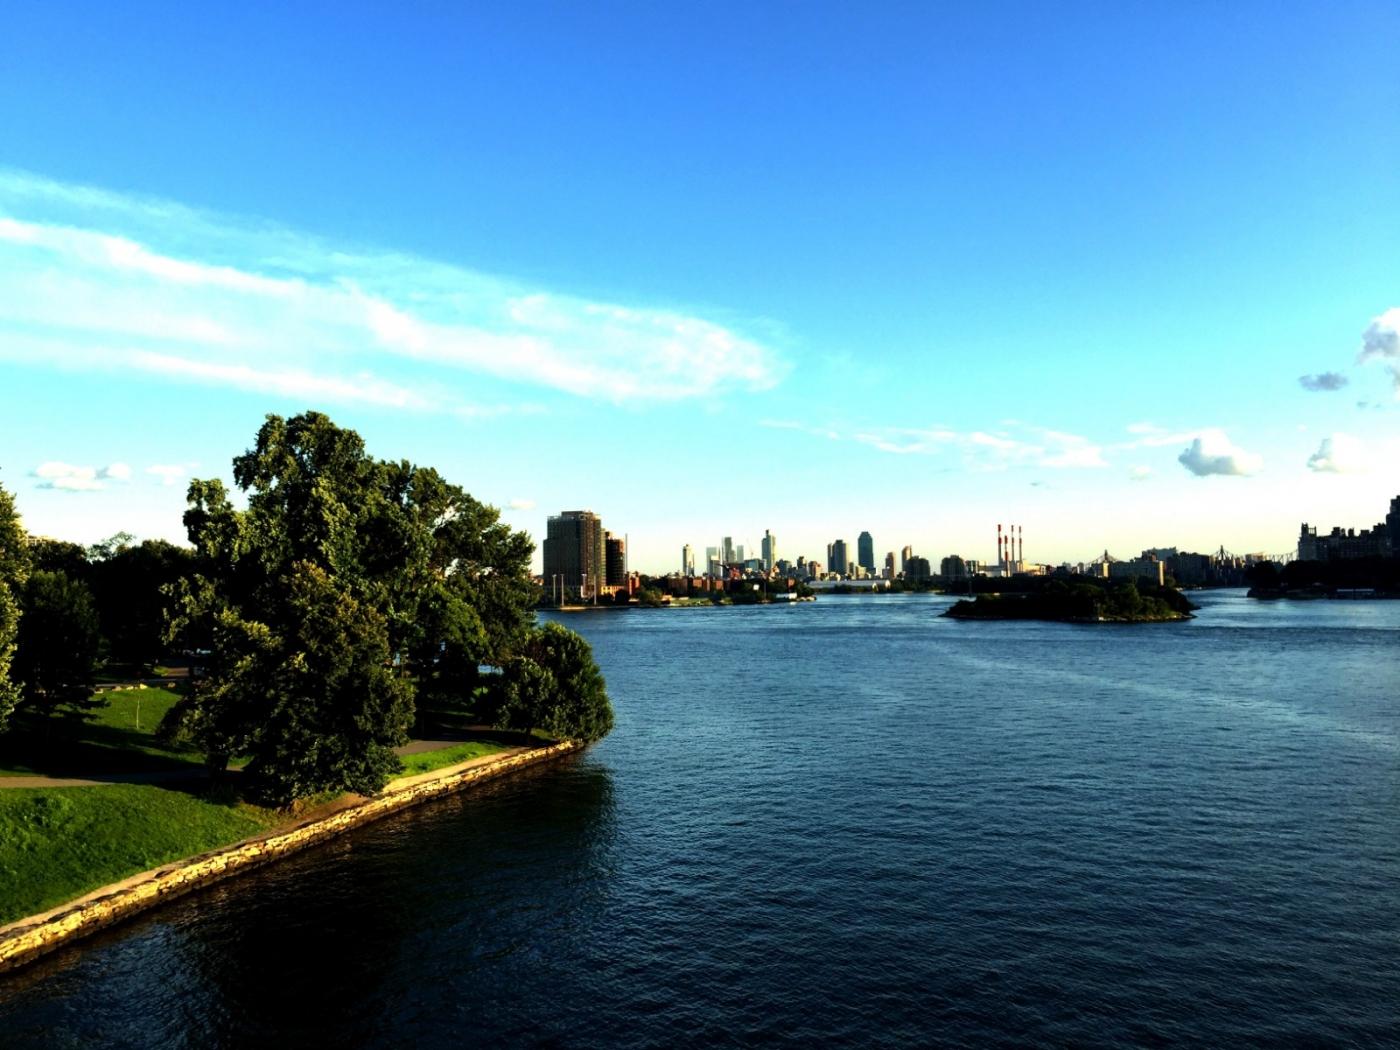 回头一瞅 美在东河 Manhattan East River_图1-17